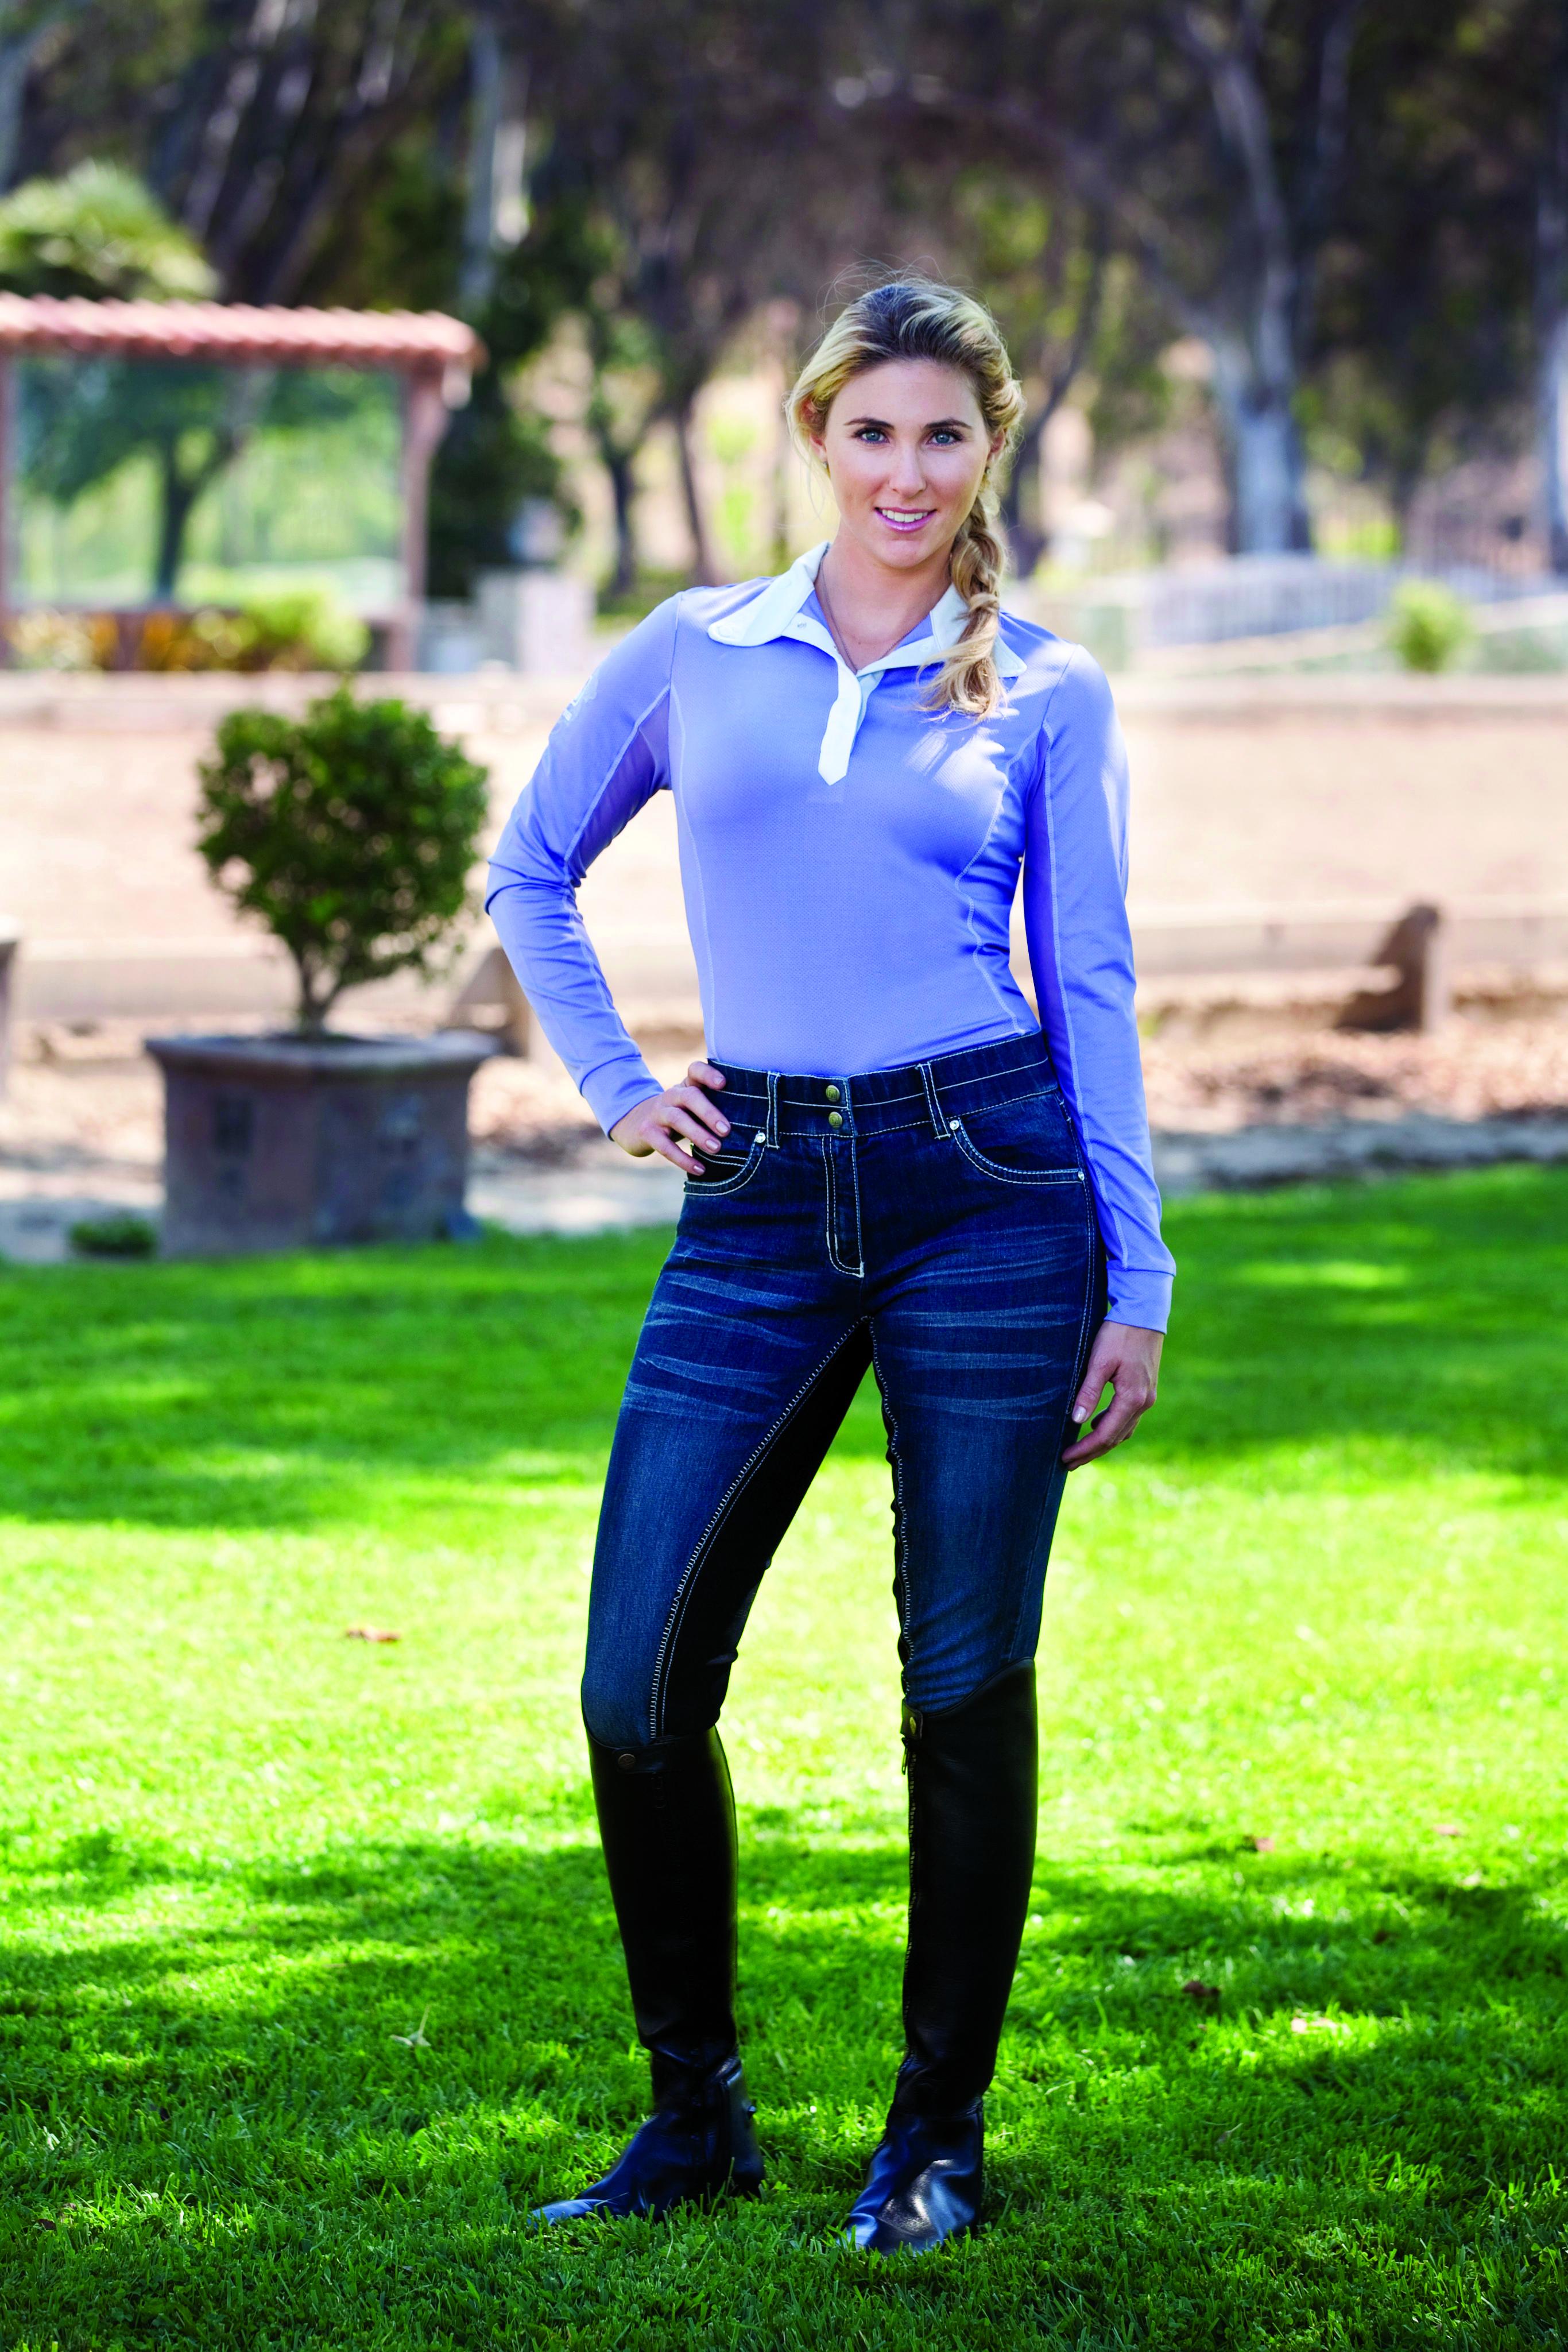 ROMFH Sarafina Ladies' Fullseat Breeches